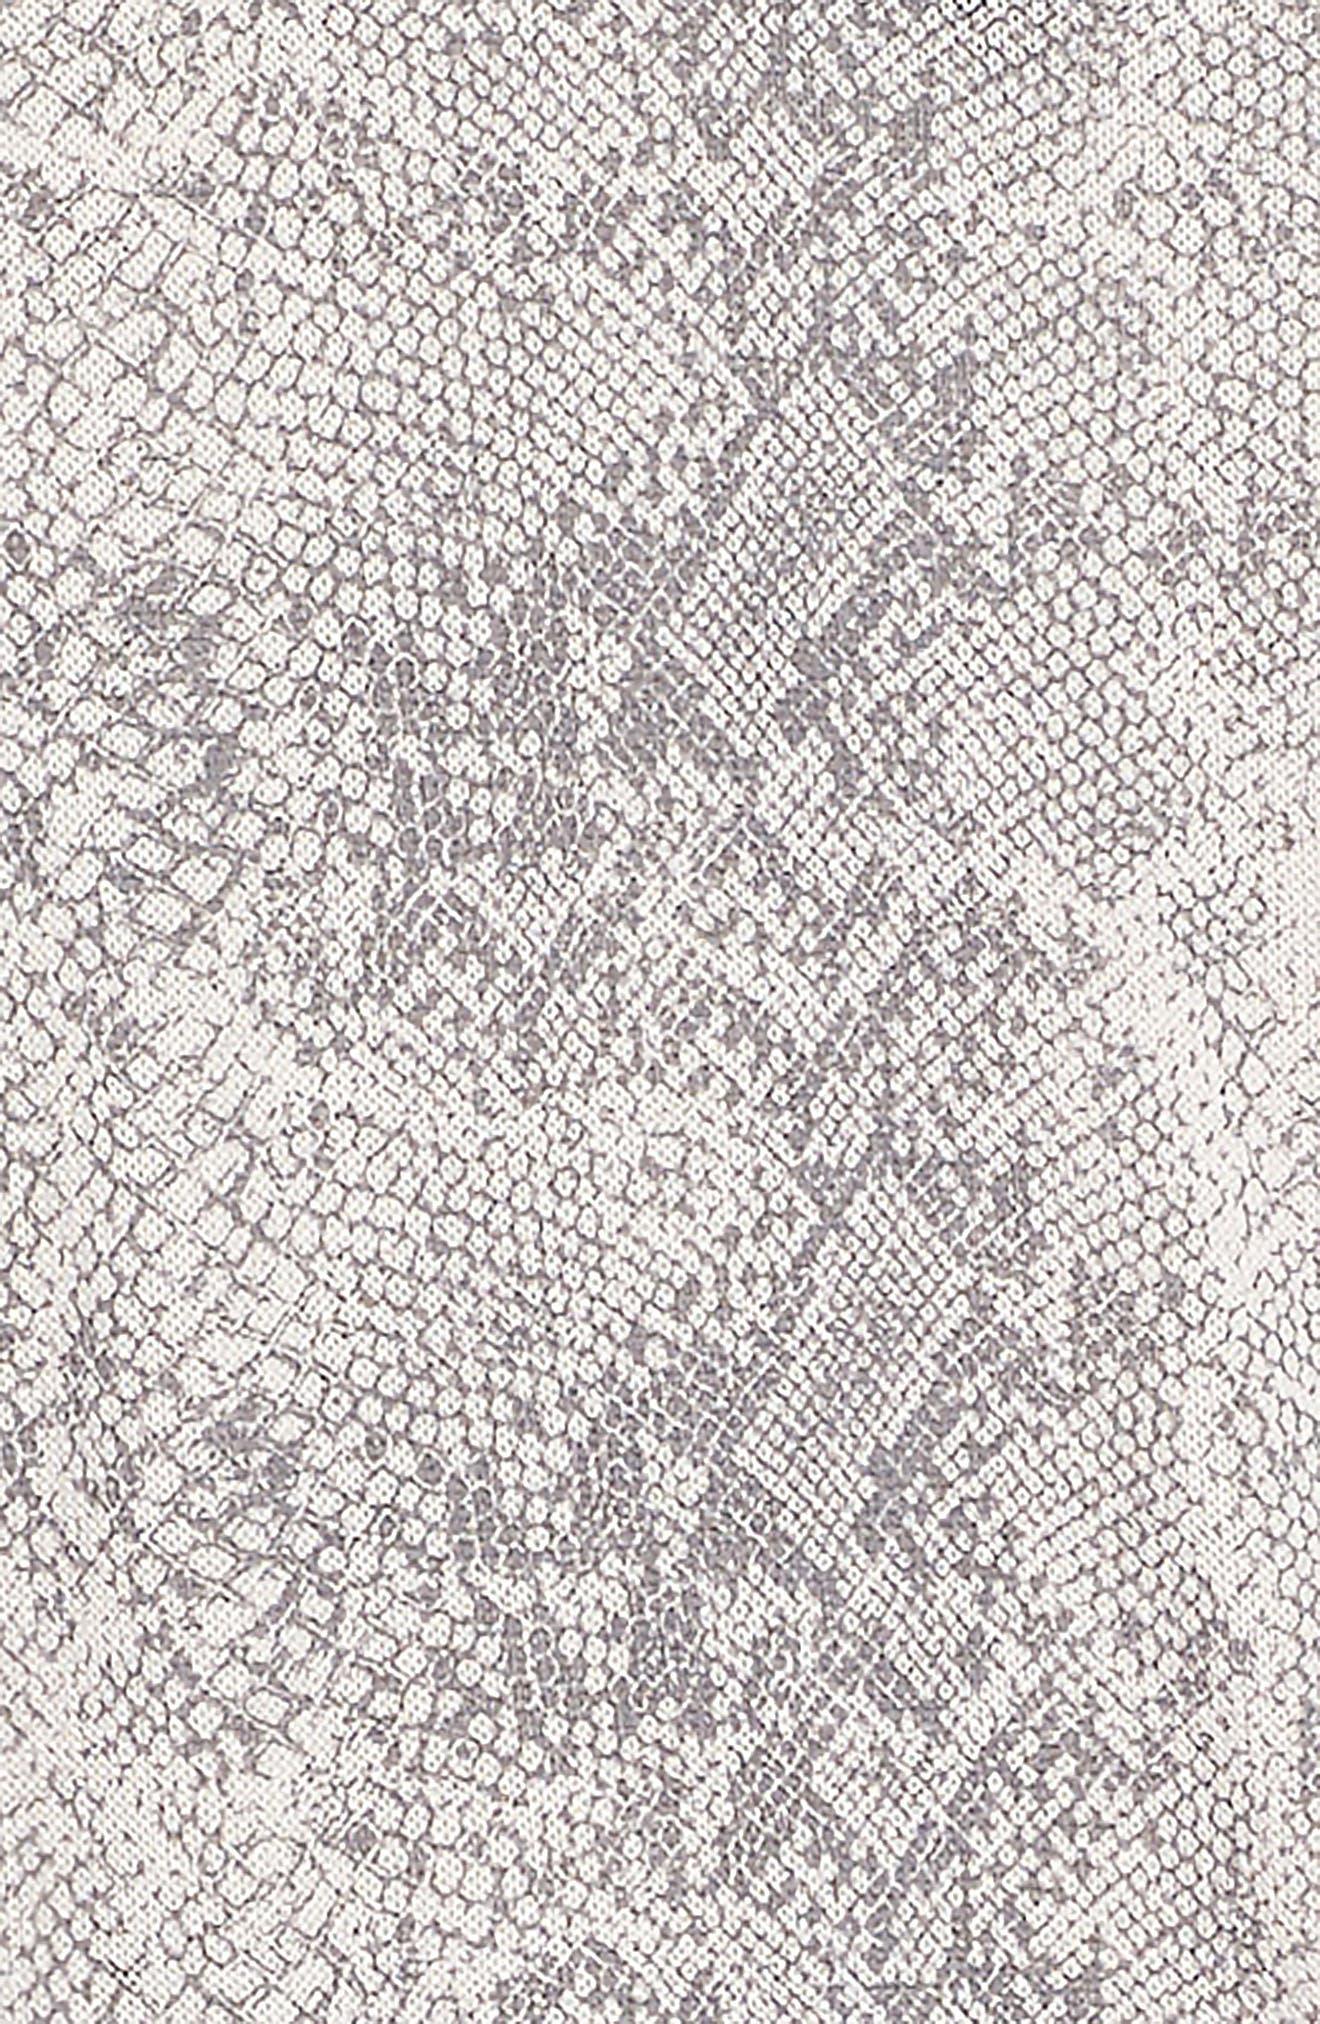 Python Print Loose Knit Dress,                             Alternate thumbnail 3, color,                             655